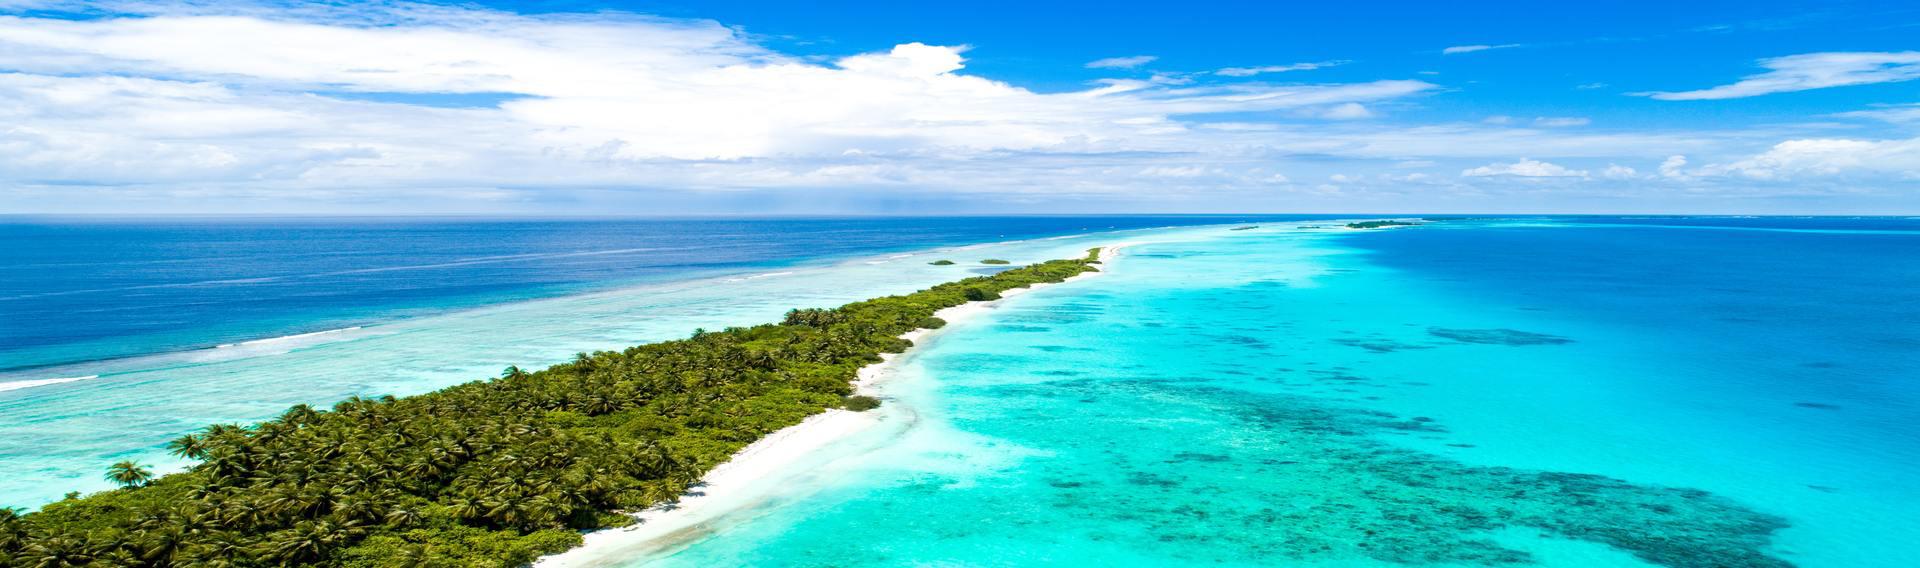 Vacances Maldives